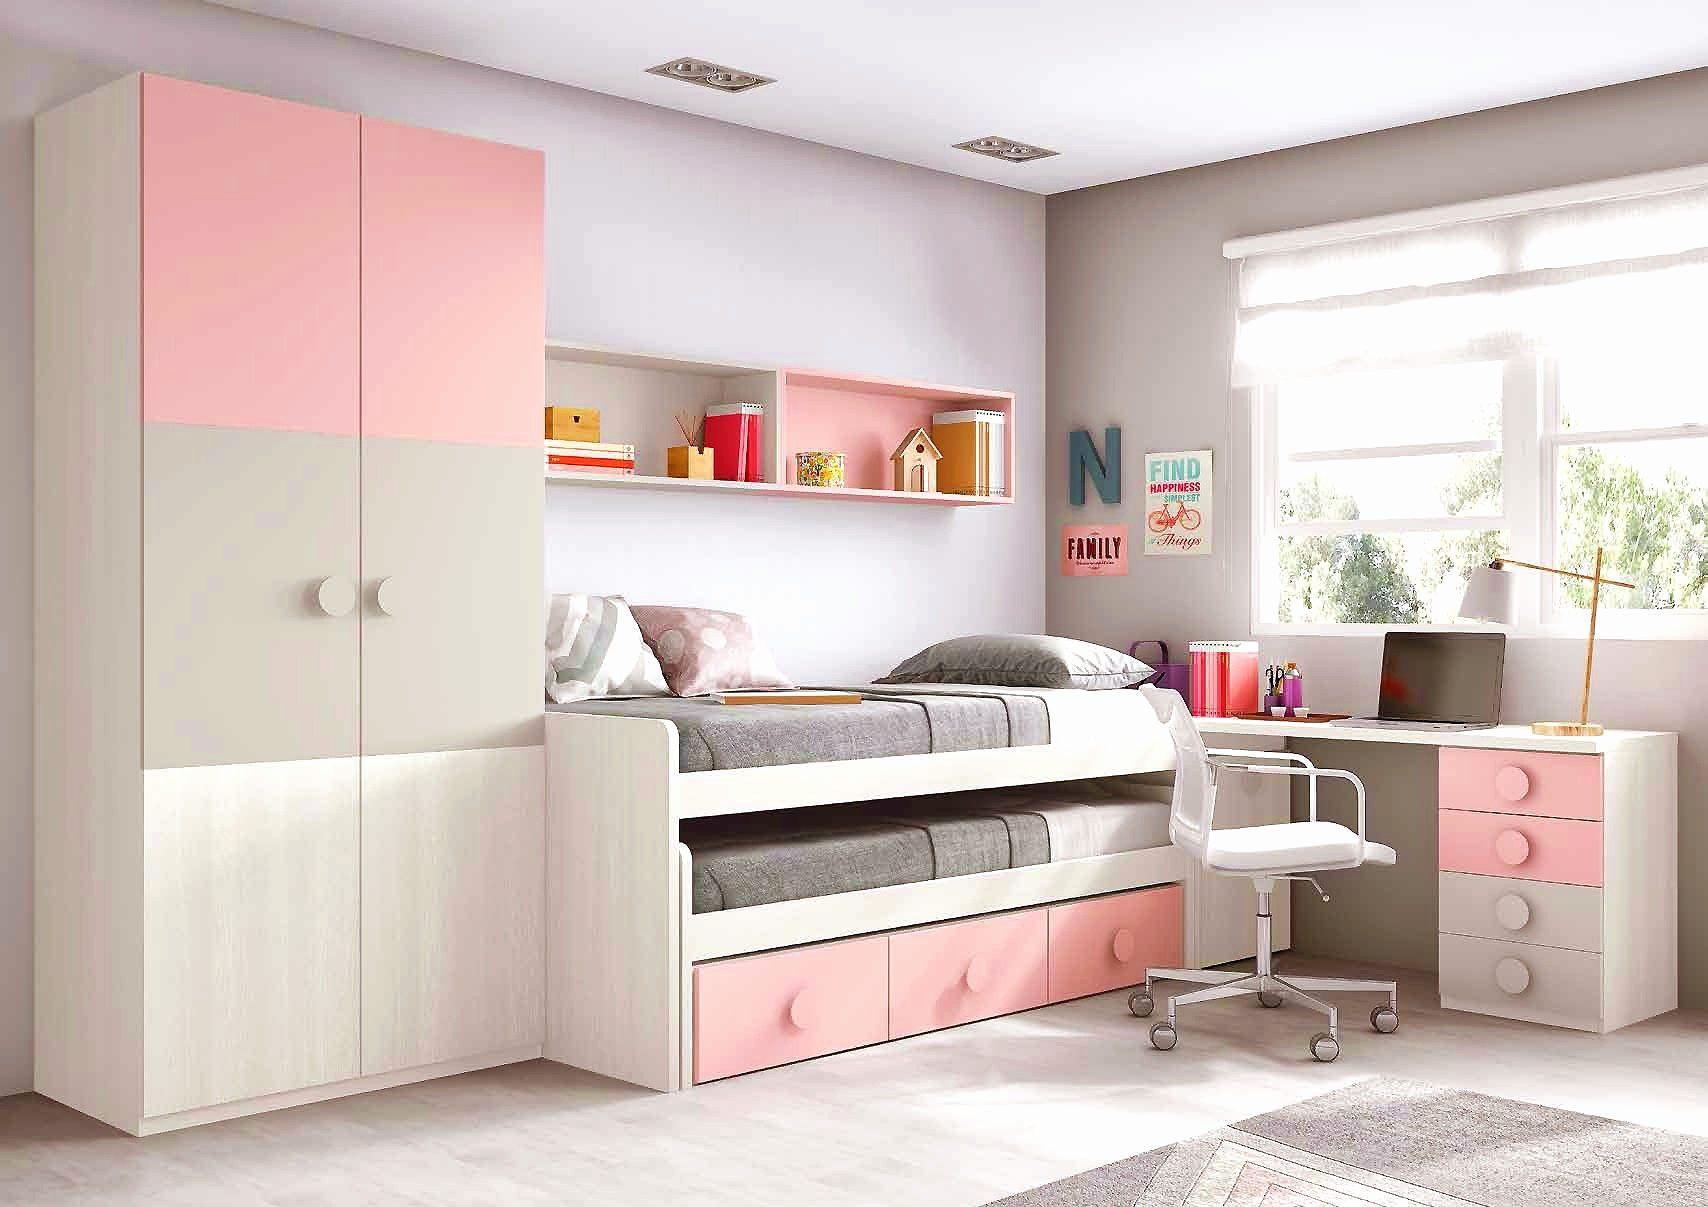 Lit Gigogne 2 Places Ikea Magnifique Banquette Lit Ikea Inspirant Interior 50 Inspirational Ikea sofa